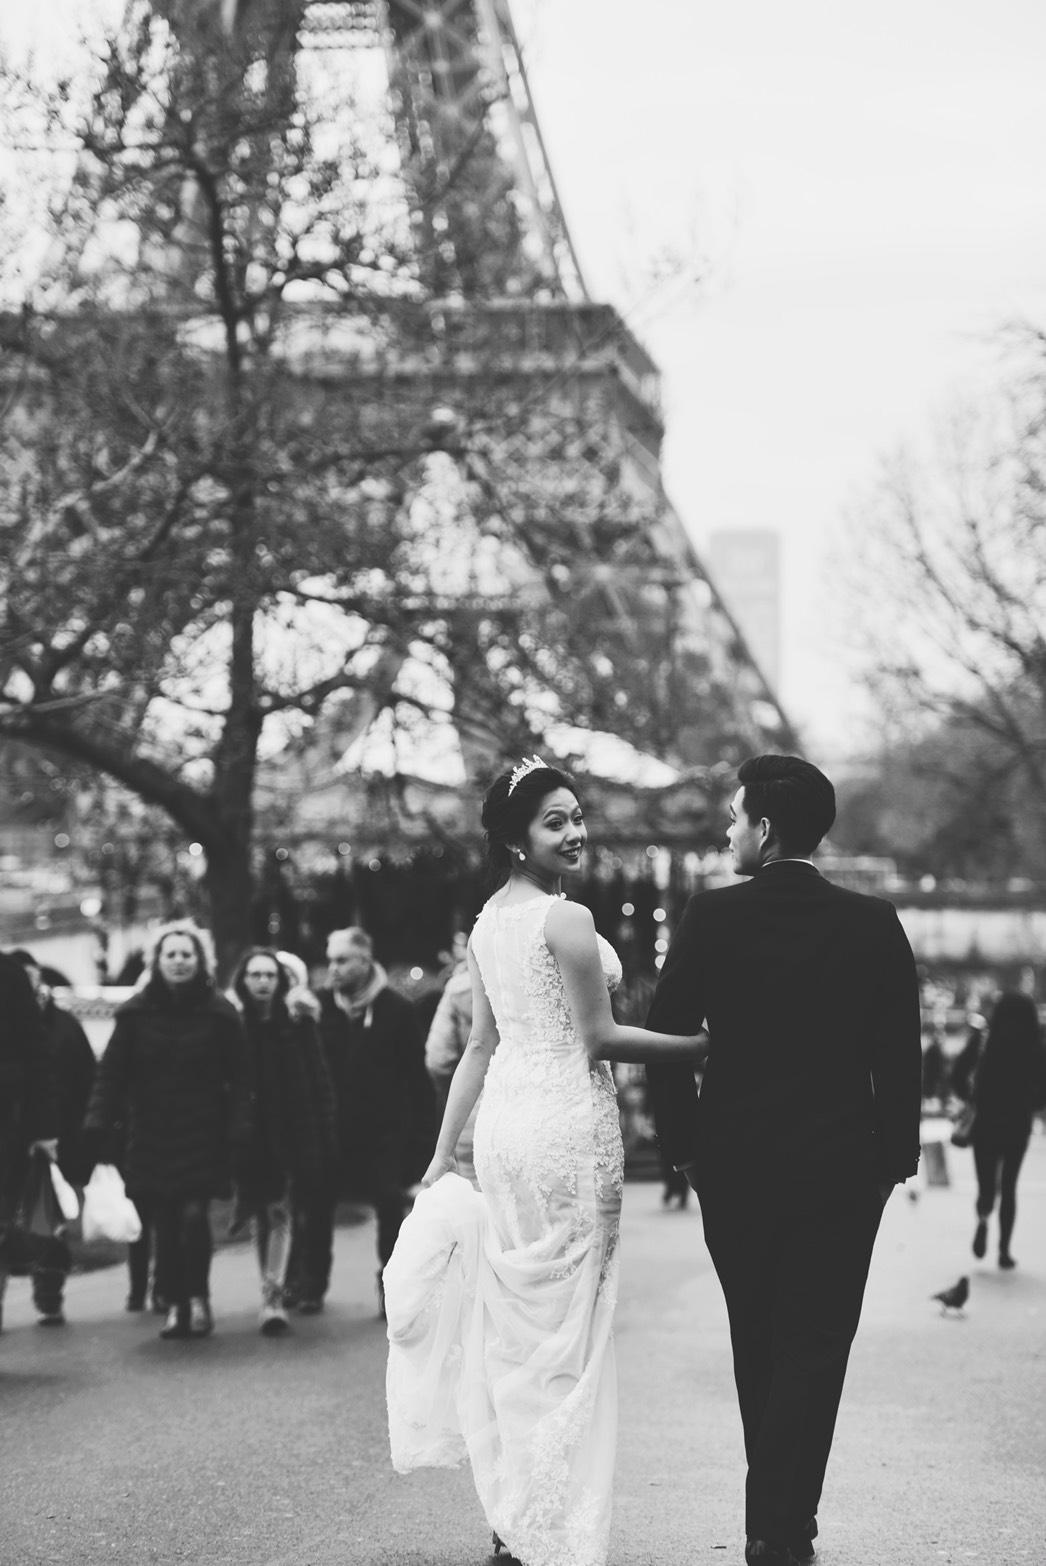 PUREFOTO_海外婚紗攝影Oversea_Prewedding_Paris Prewedding